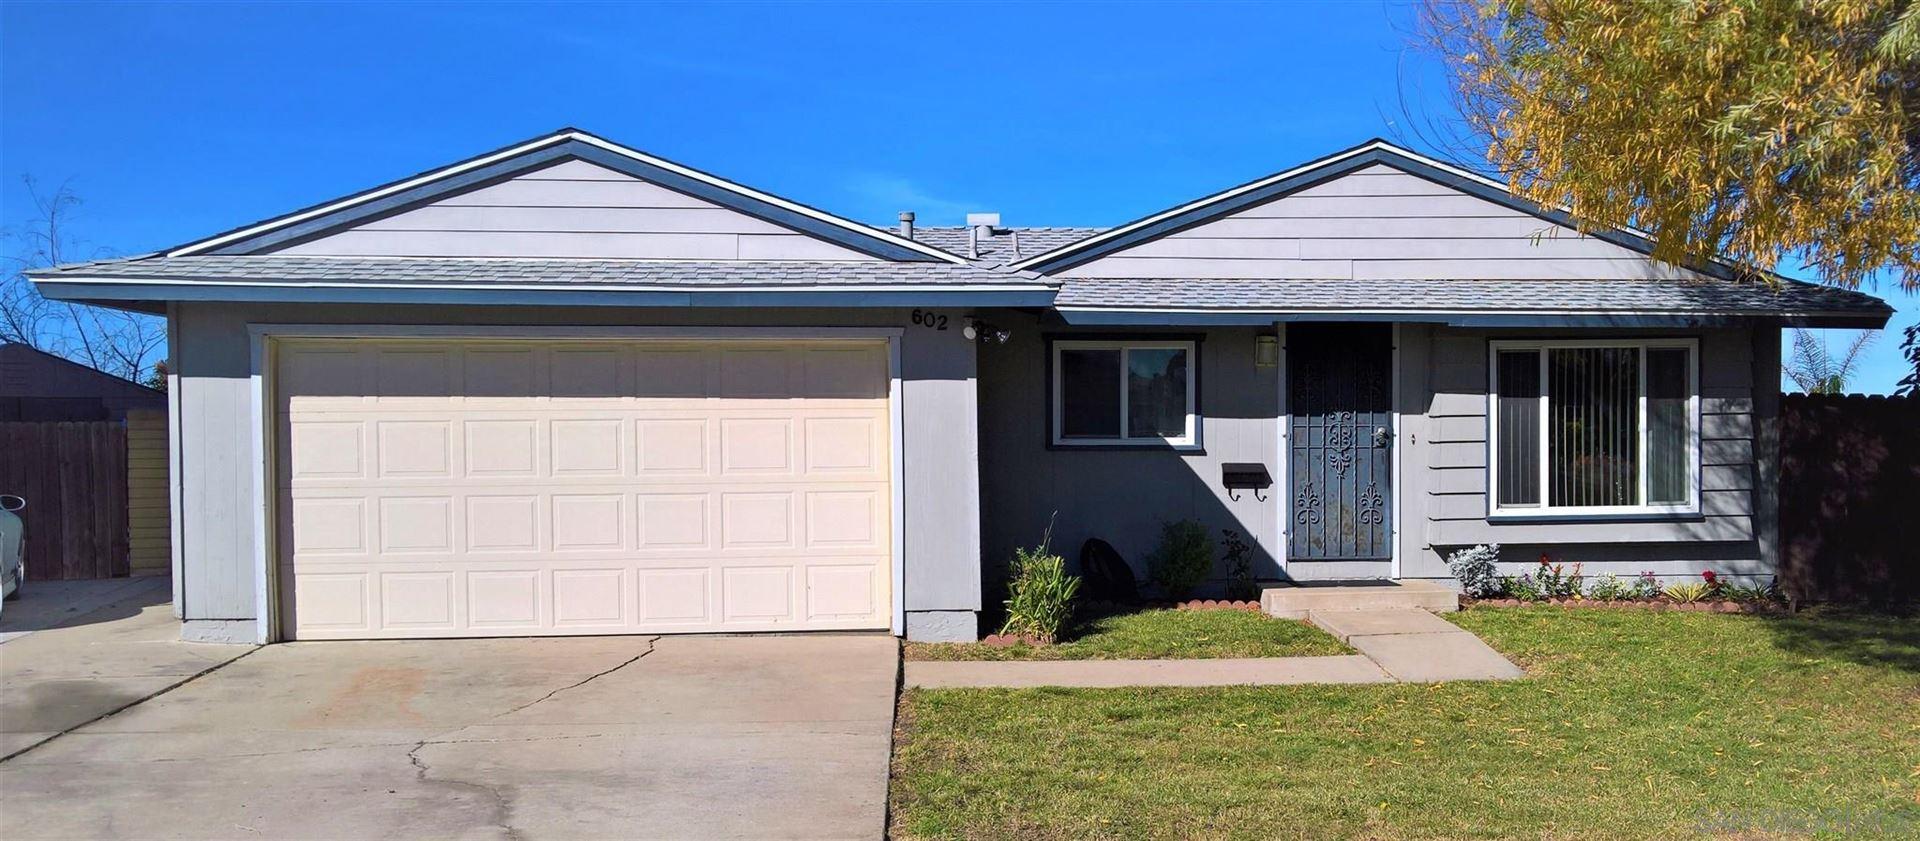 Photo for 602 Rickenbacker Ave, San Diego, CA 92154 (MLS # 210001013)